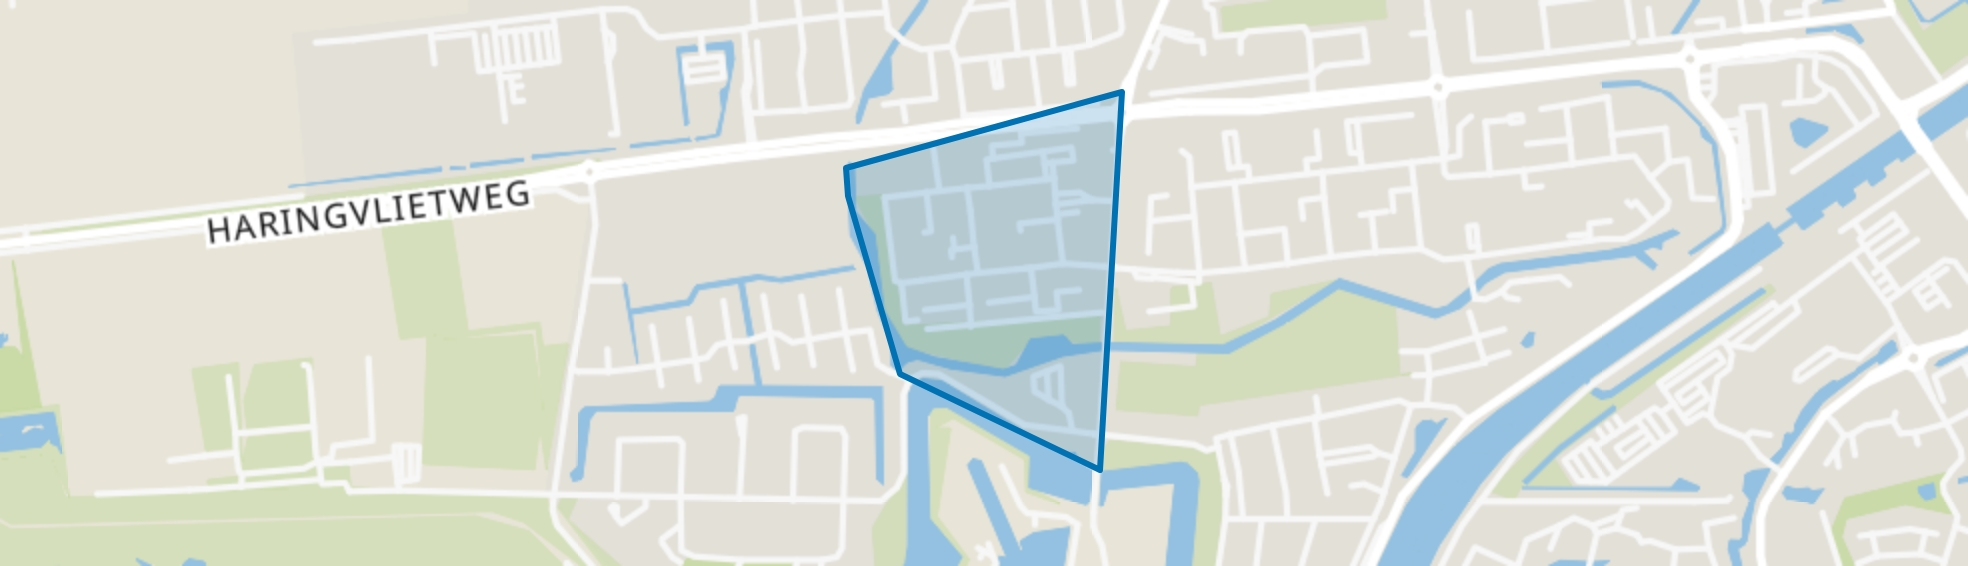 Marinebuurt, Hellevoetsluis map